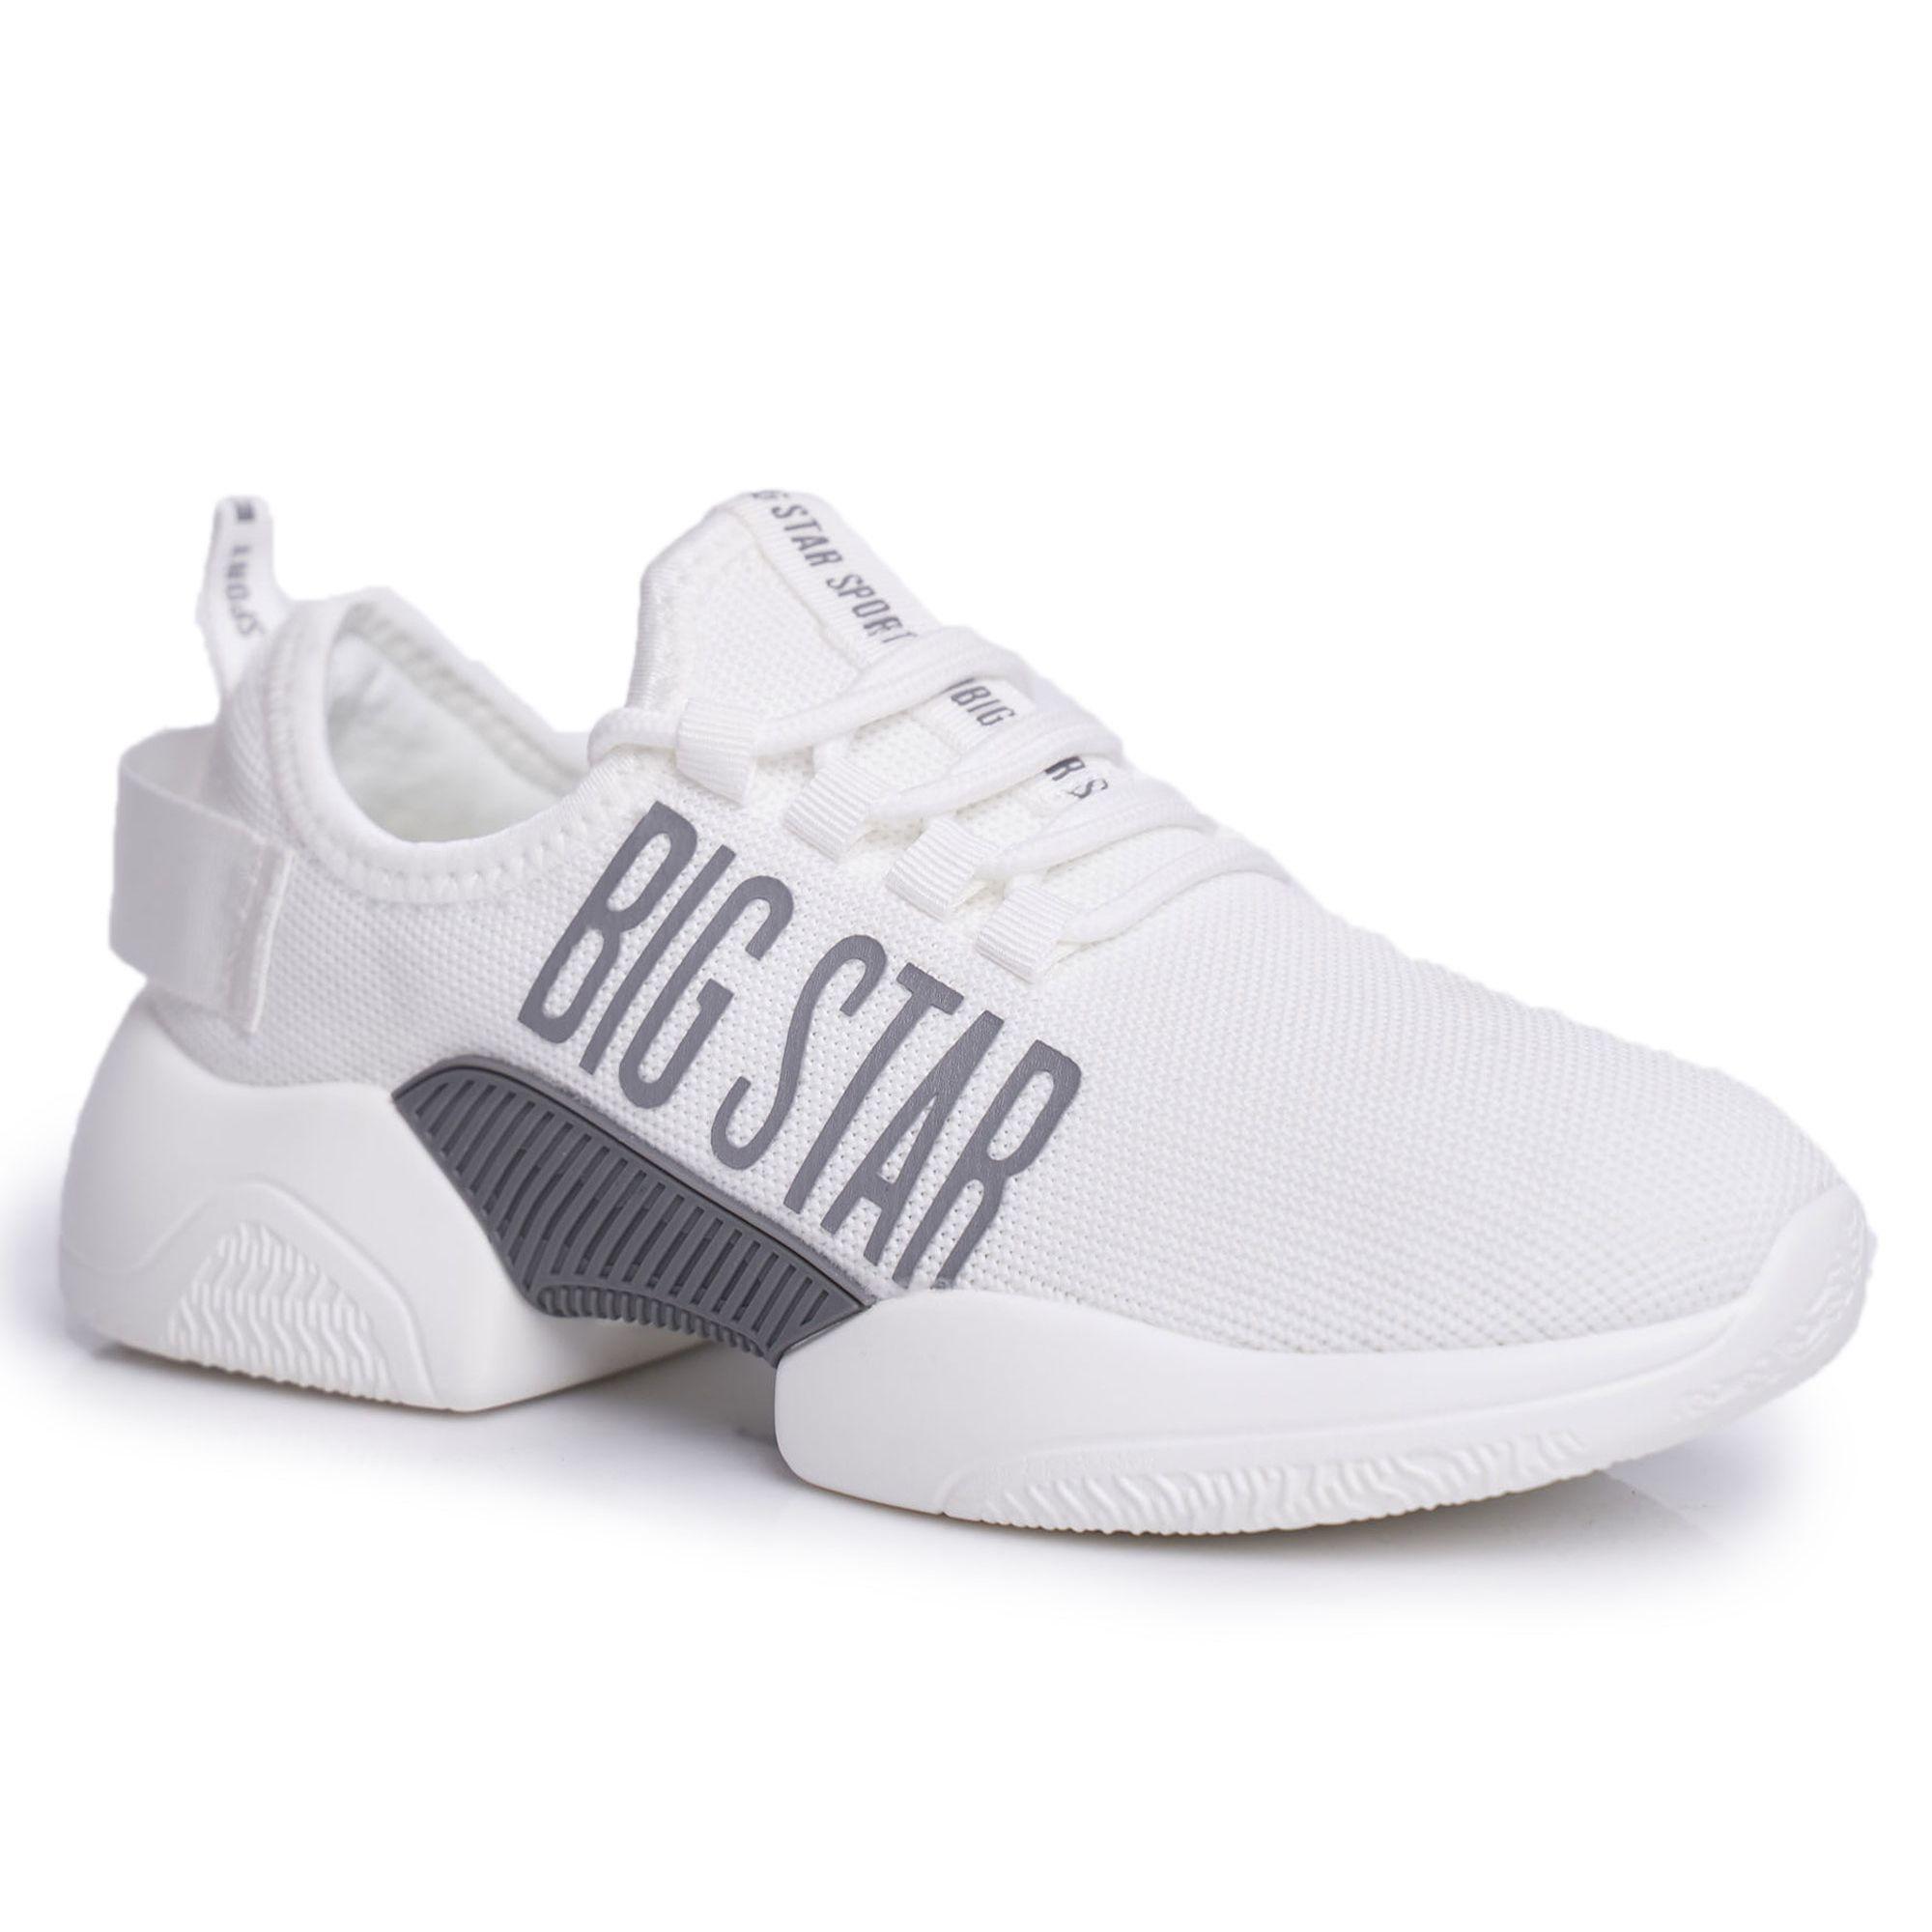 Damskie Sportowe Obuwie Big Star Biale Ff274282 Fashion Capri Pants Pants